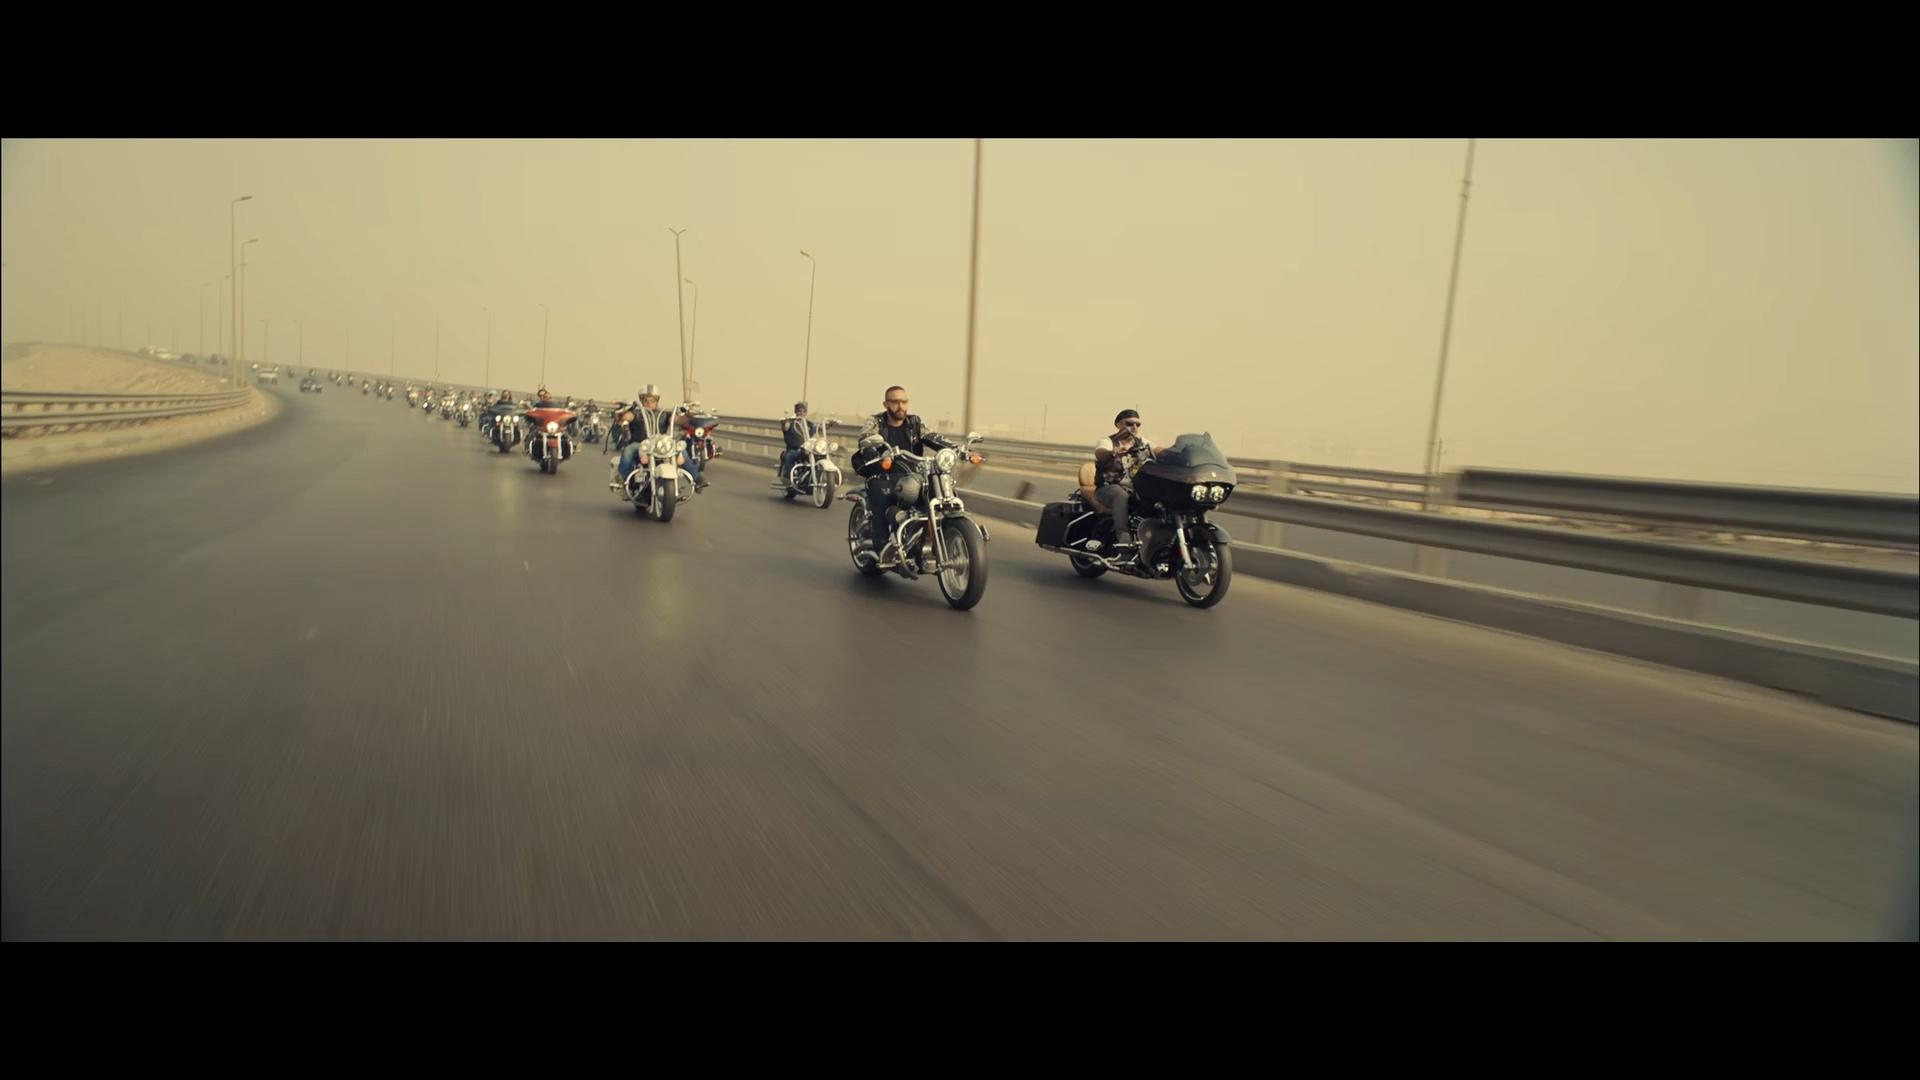 [فيلم][تورنت][تحميل][هروب اضطراري][2017][1080p][Web-DL] 9 arabp2p.com